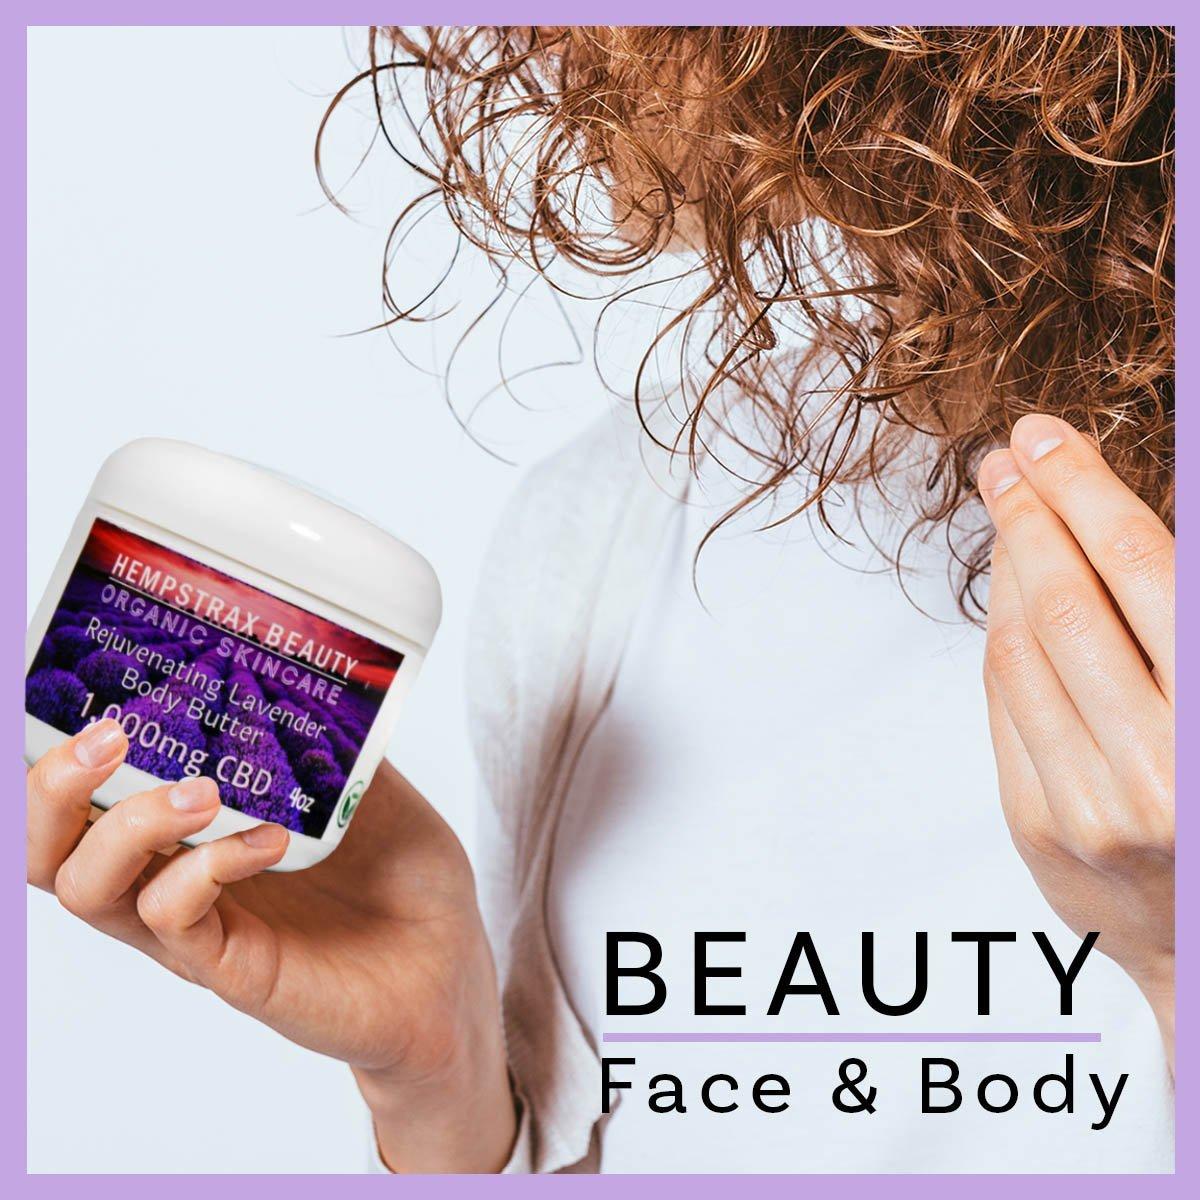 Hempstrax CBD Beauty Products